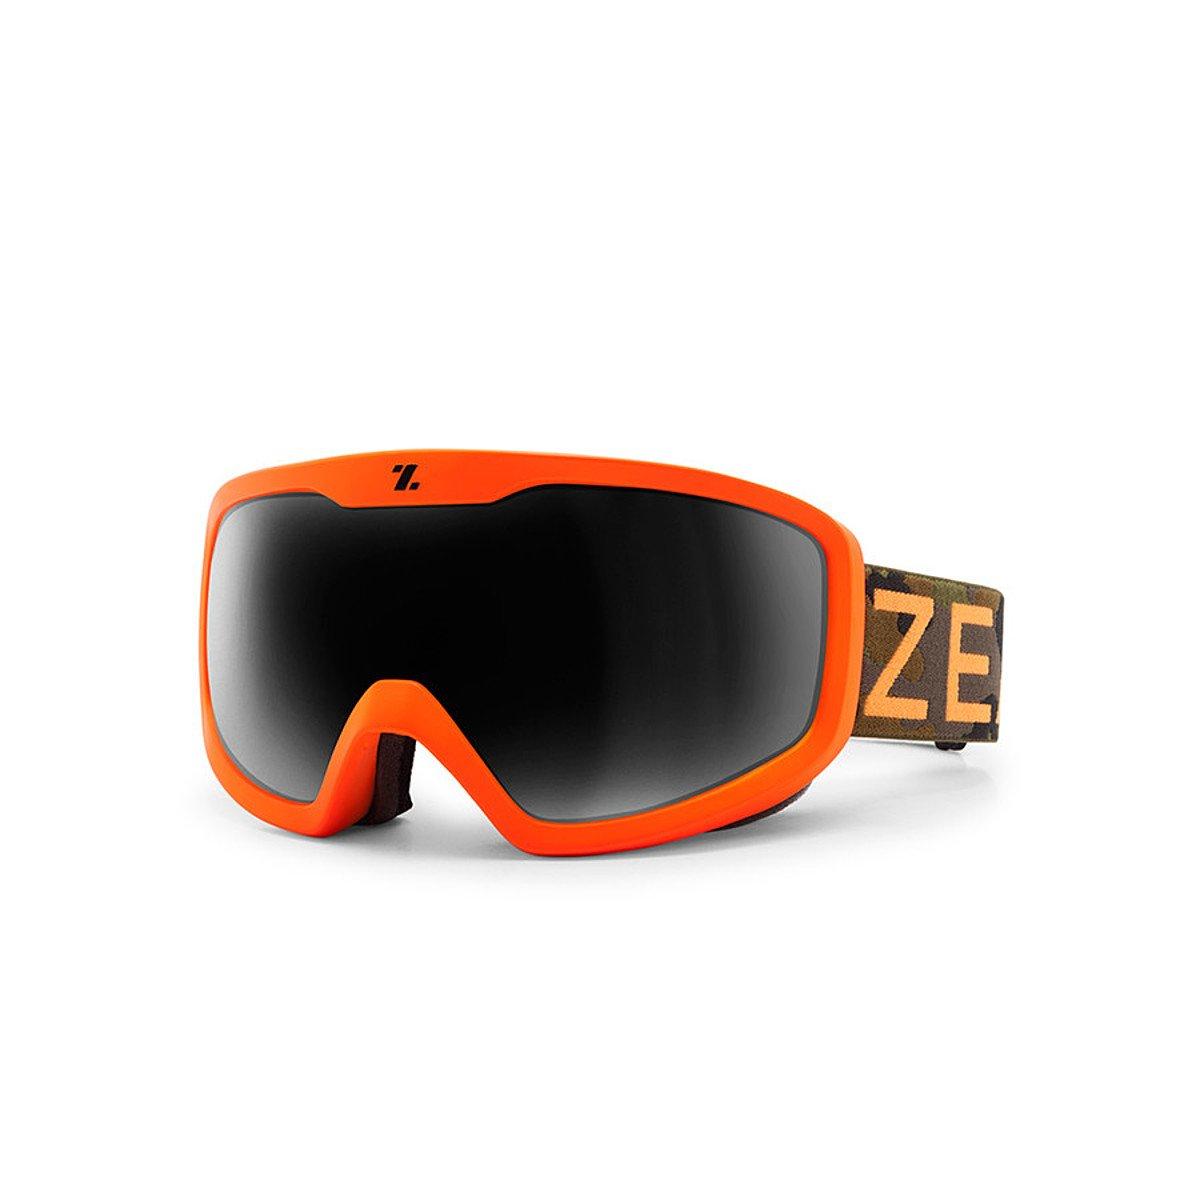 c501d0dc810 Amazon.com   Zeal Optics Tramline - Full Frame Ski   Snowboard Goggles -  Alpine Camo Frame